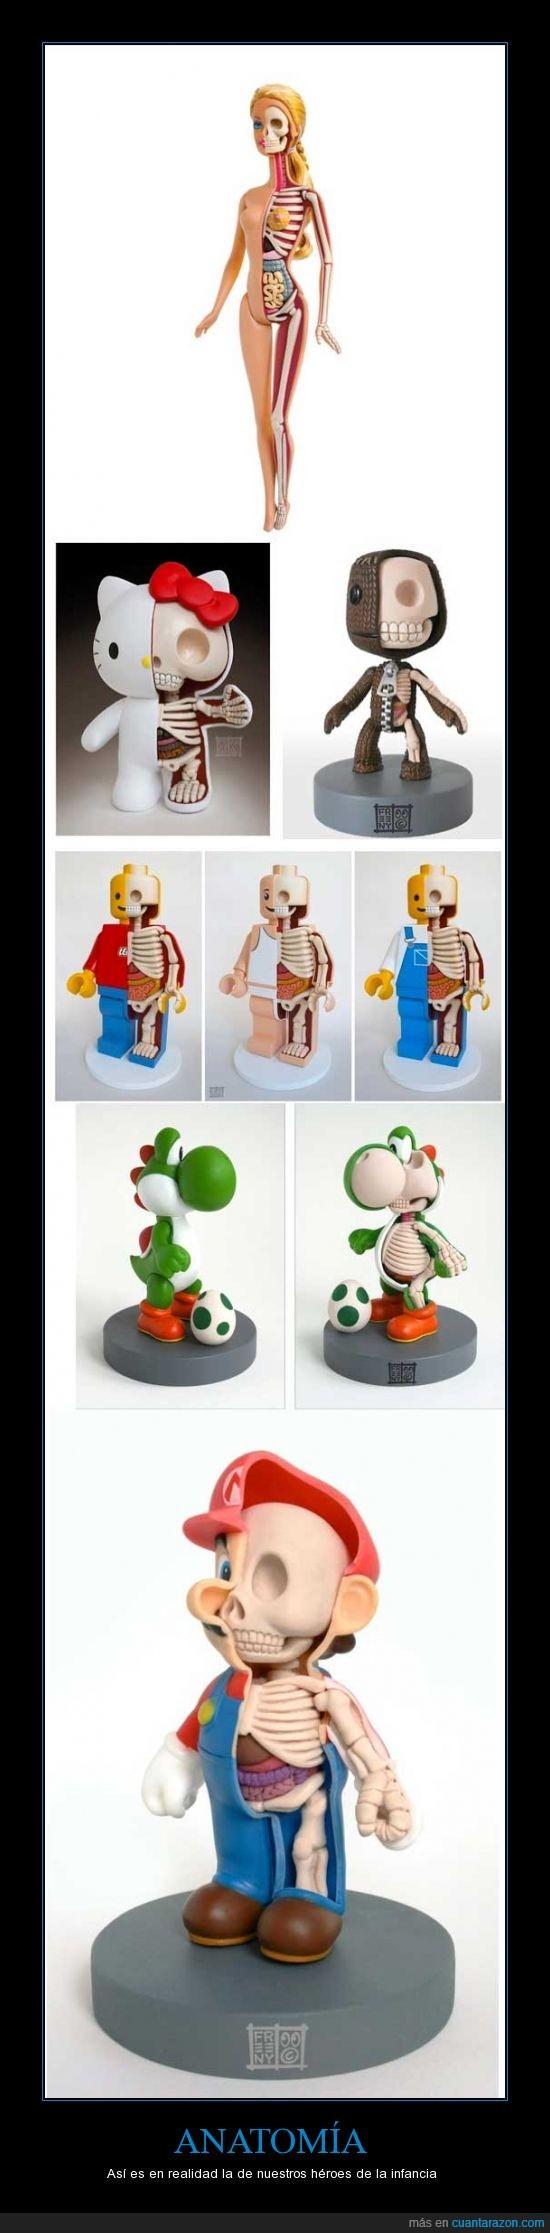 anatomia,barbie,click,cuerpo,esqueleto,hueso,infancia,lego,mario,mitad,yoshi